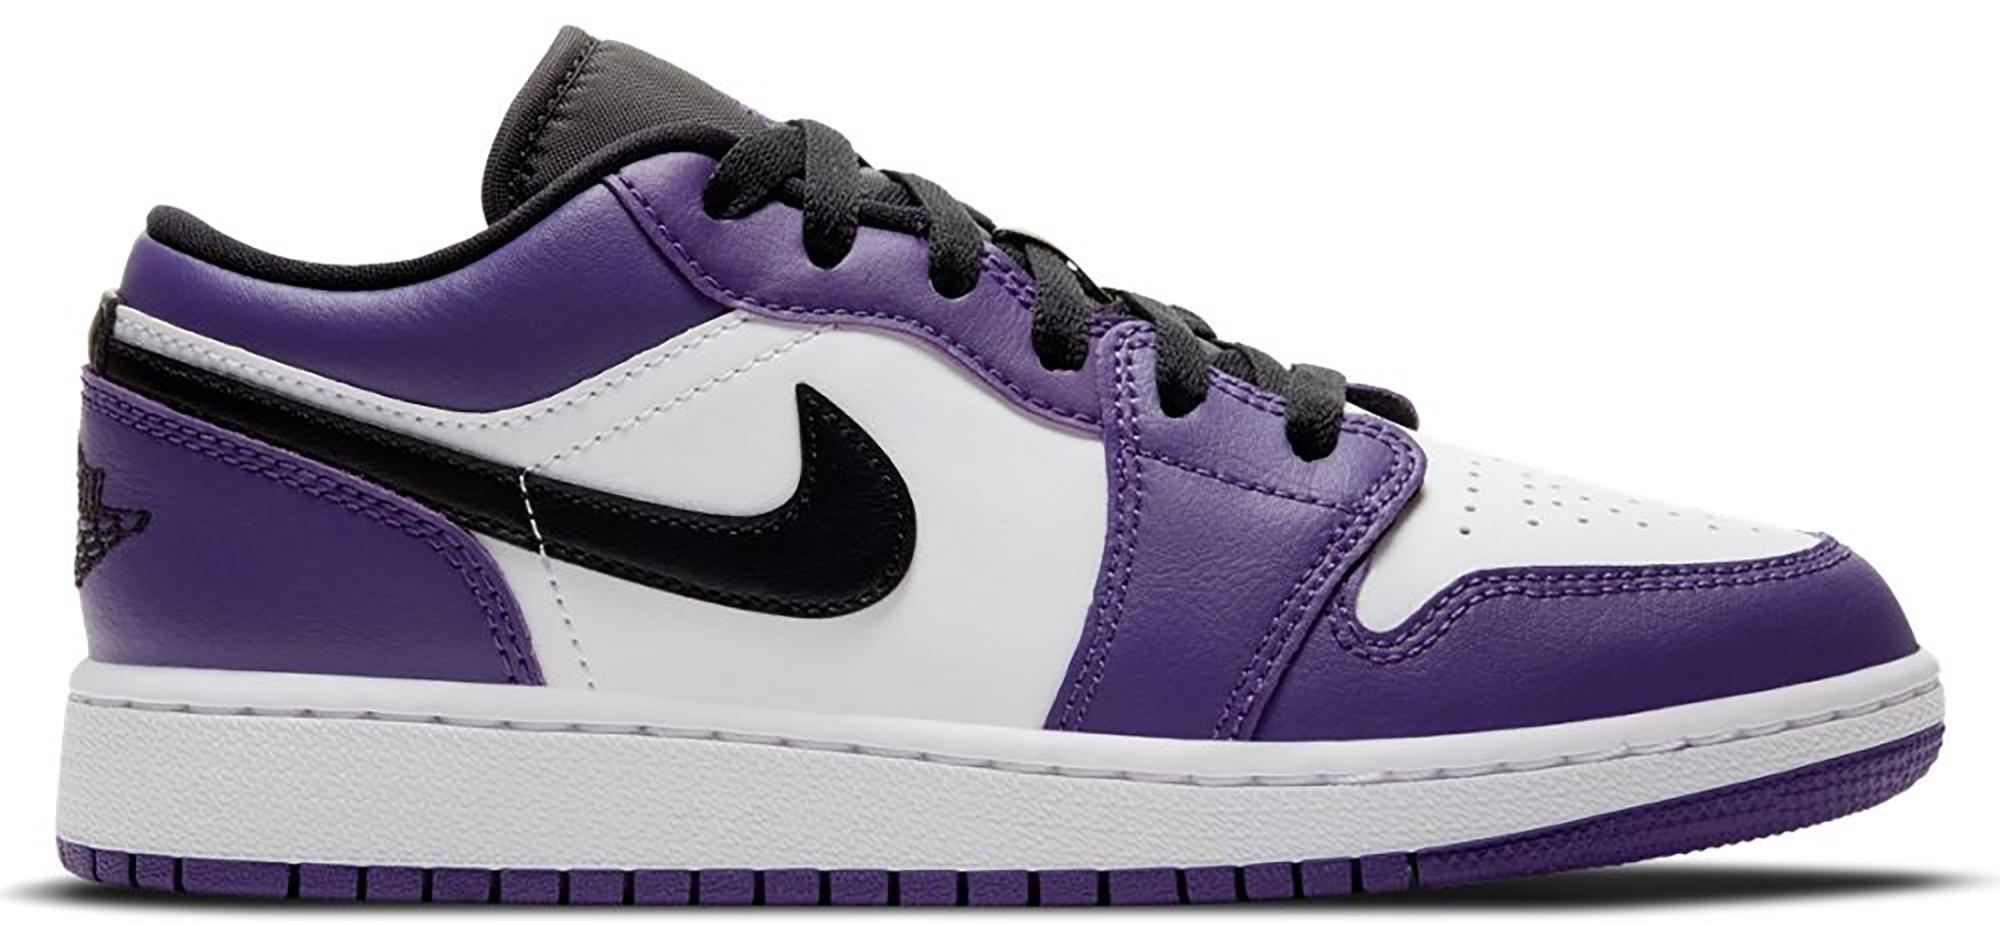 Jordan 1 Low Court Purple White (GS